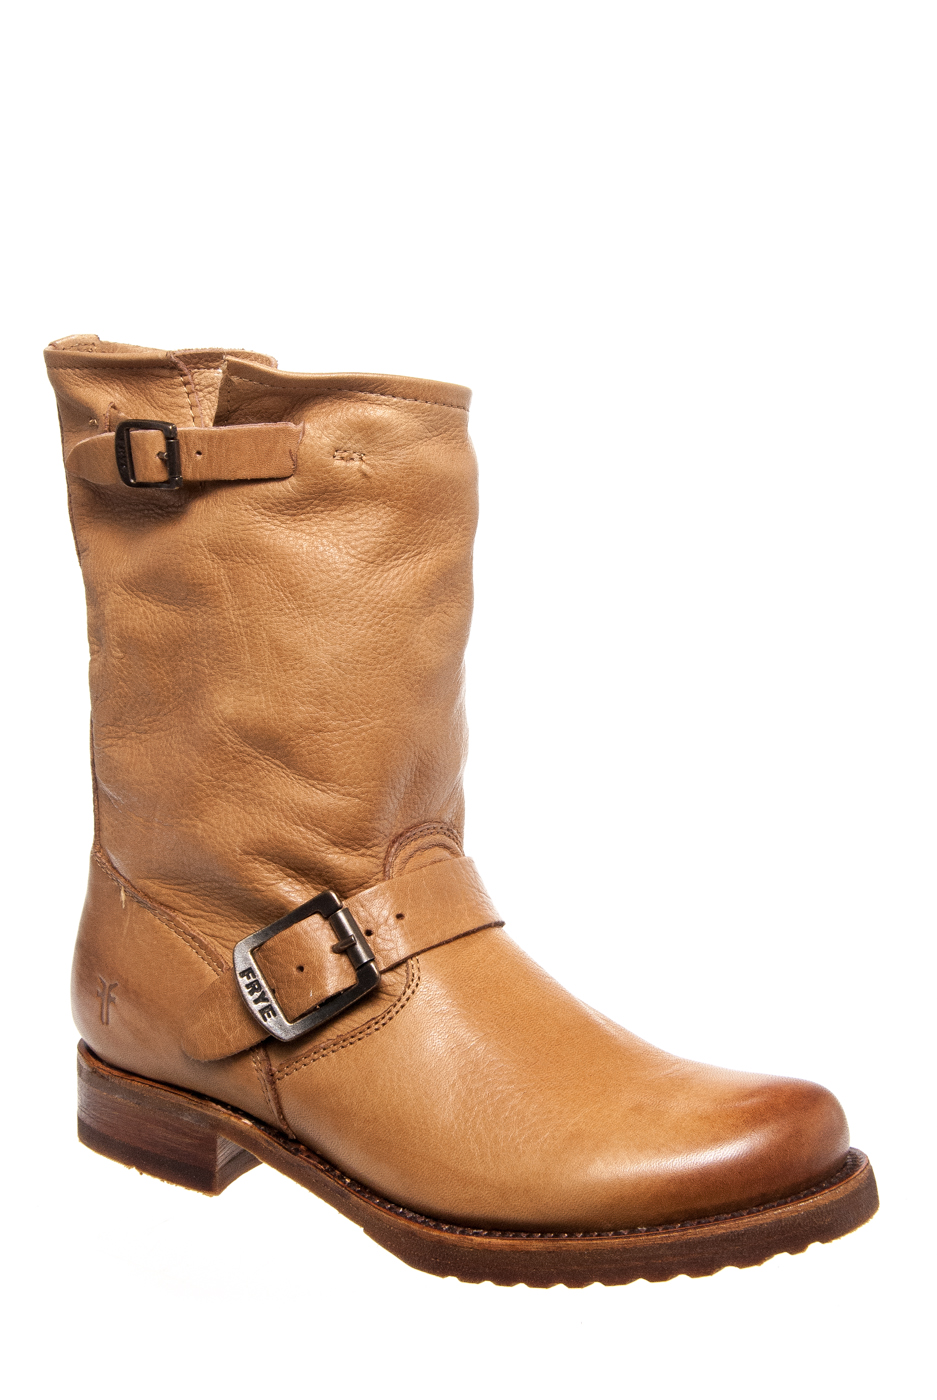 Frye Veronica Short Boots - Camel